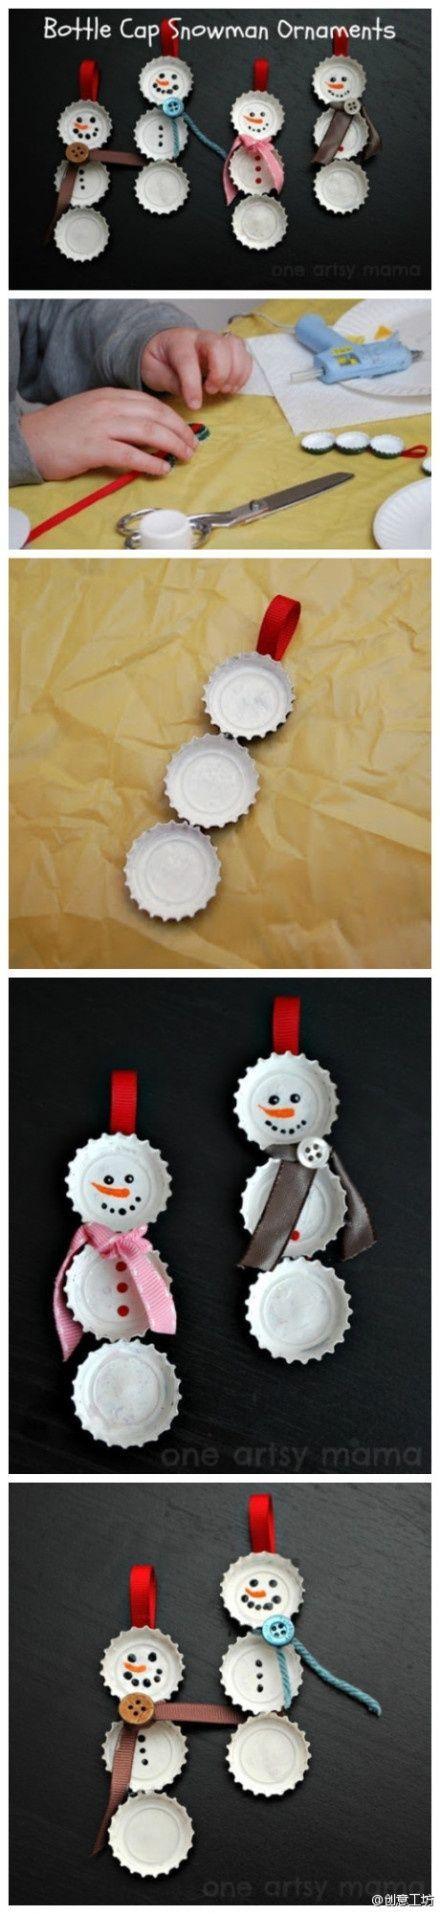 利用废弃的瓶盖制作的小雪人,让这个圣诞节充满小小创意~~~Cool Christmas Crafts , Paper Crafts for Teens , paper, craft, xmas ,wrap, gift, decor,blumen,basteln,bastelvorlage,tutorial diy, winter kids crafts, recycled, crafts , snowman, decoration,xmas